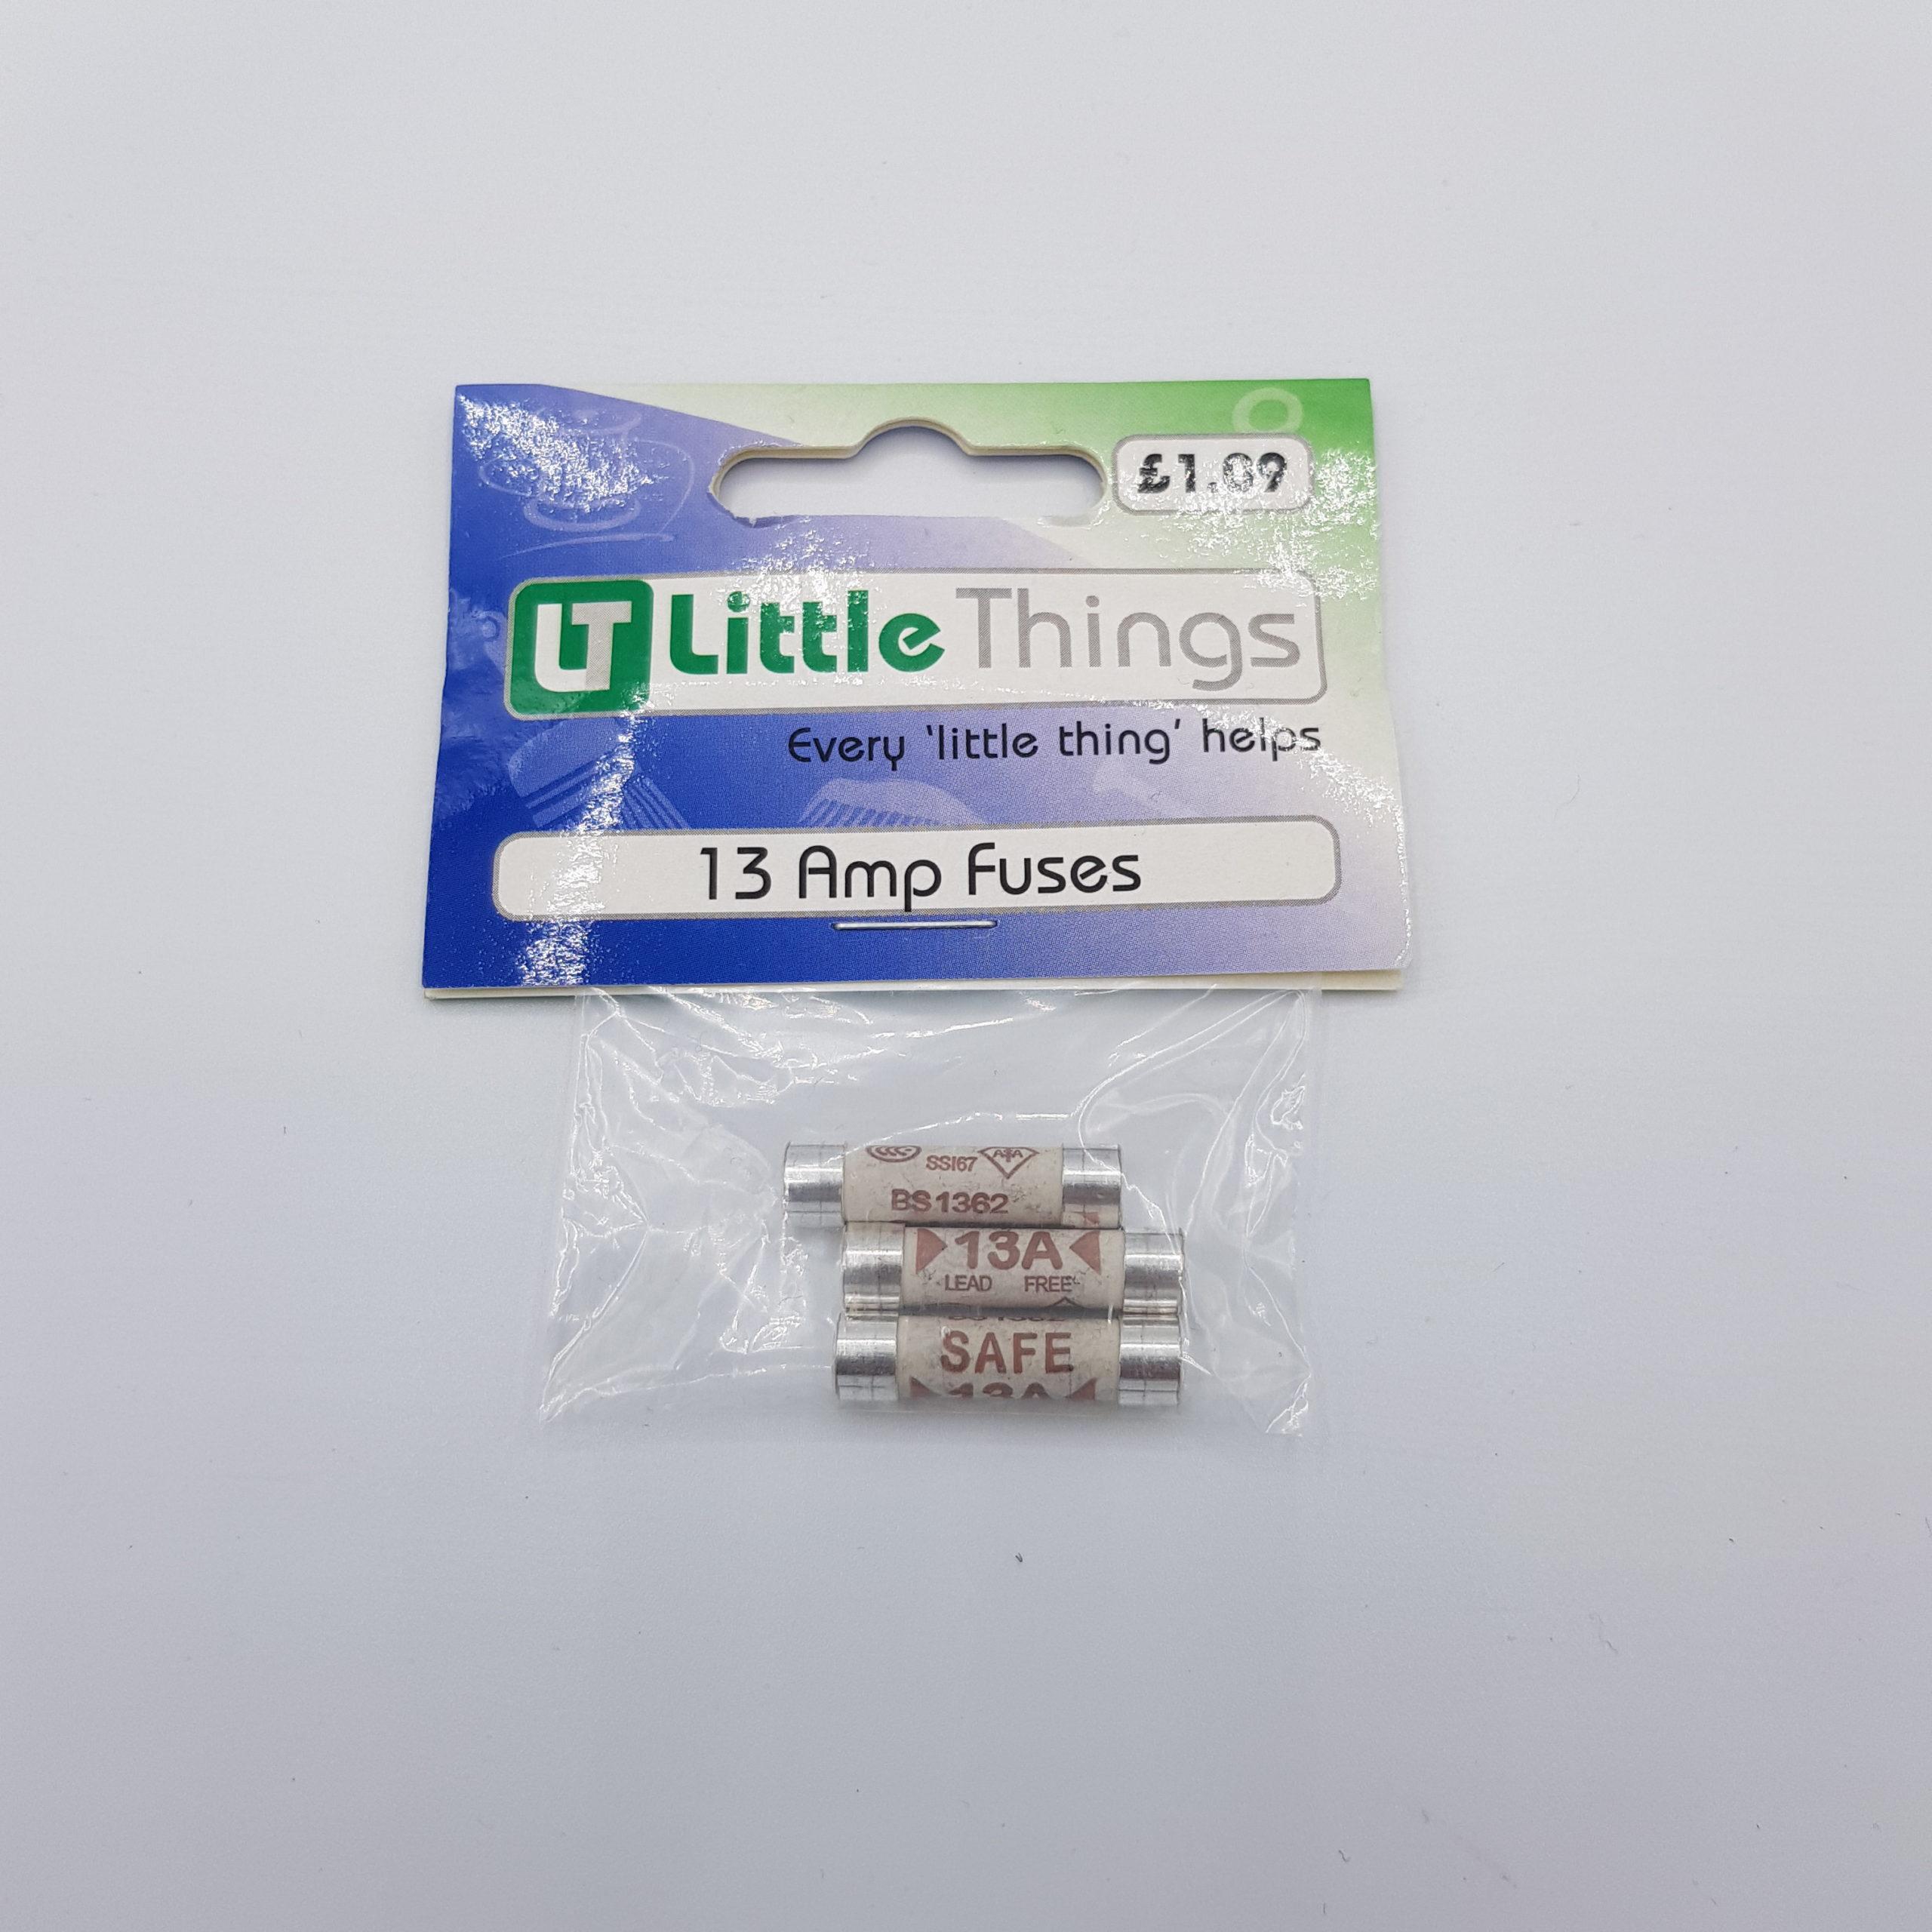 LittleThings 13 Amp Fuses